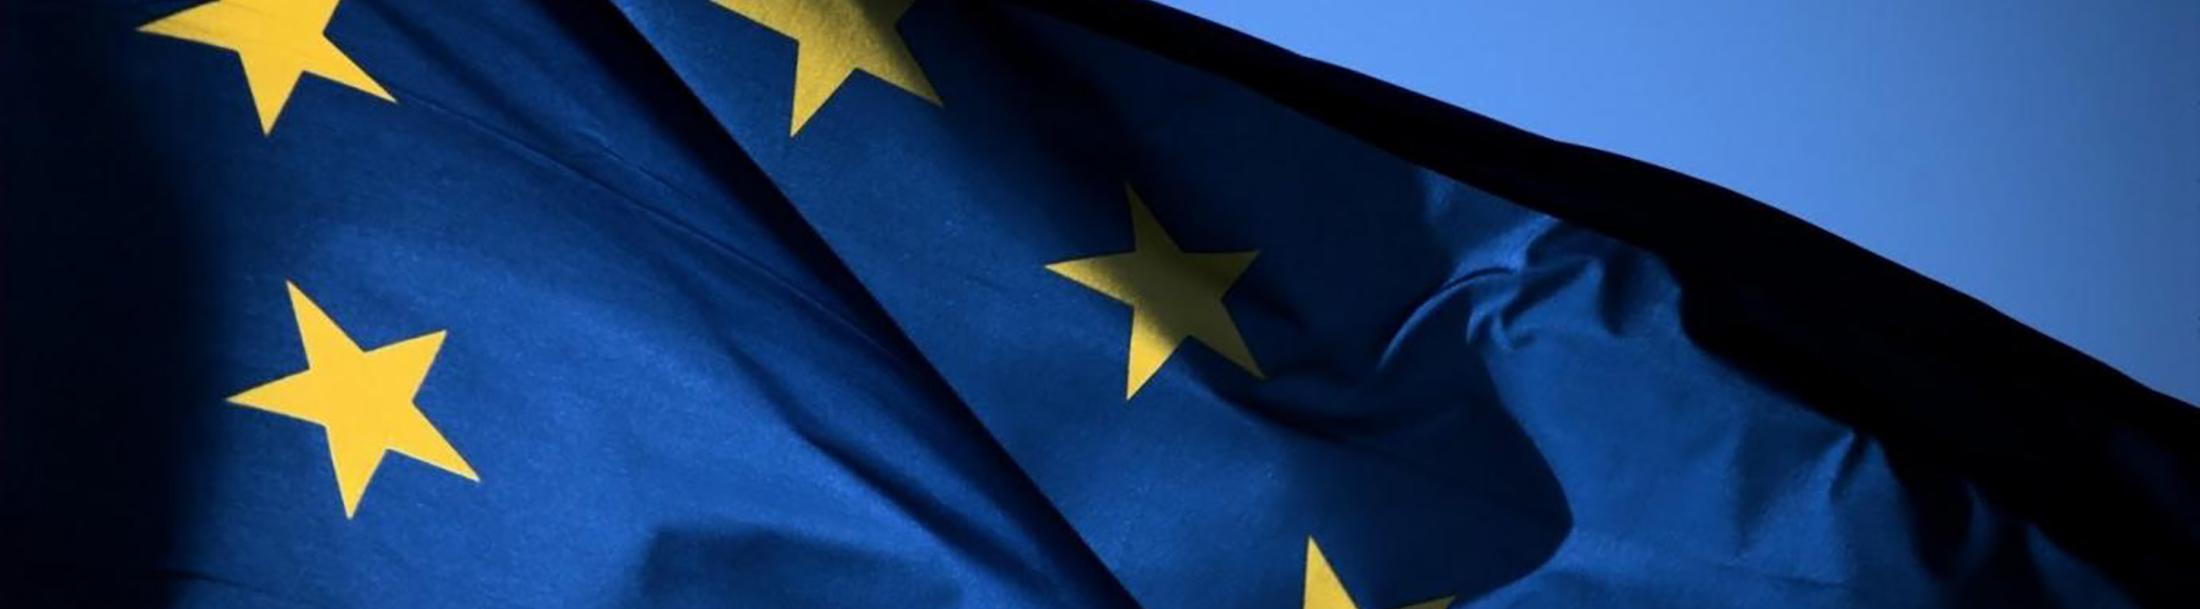 drapeau_union_europenne